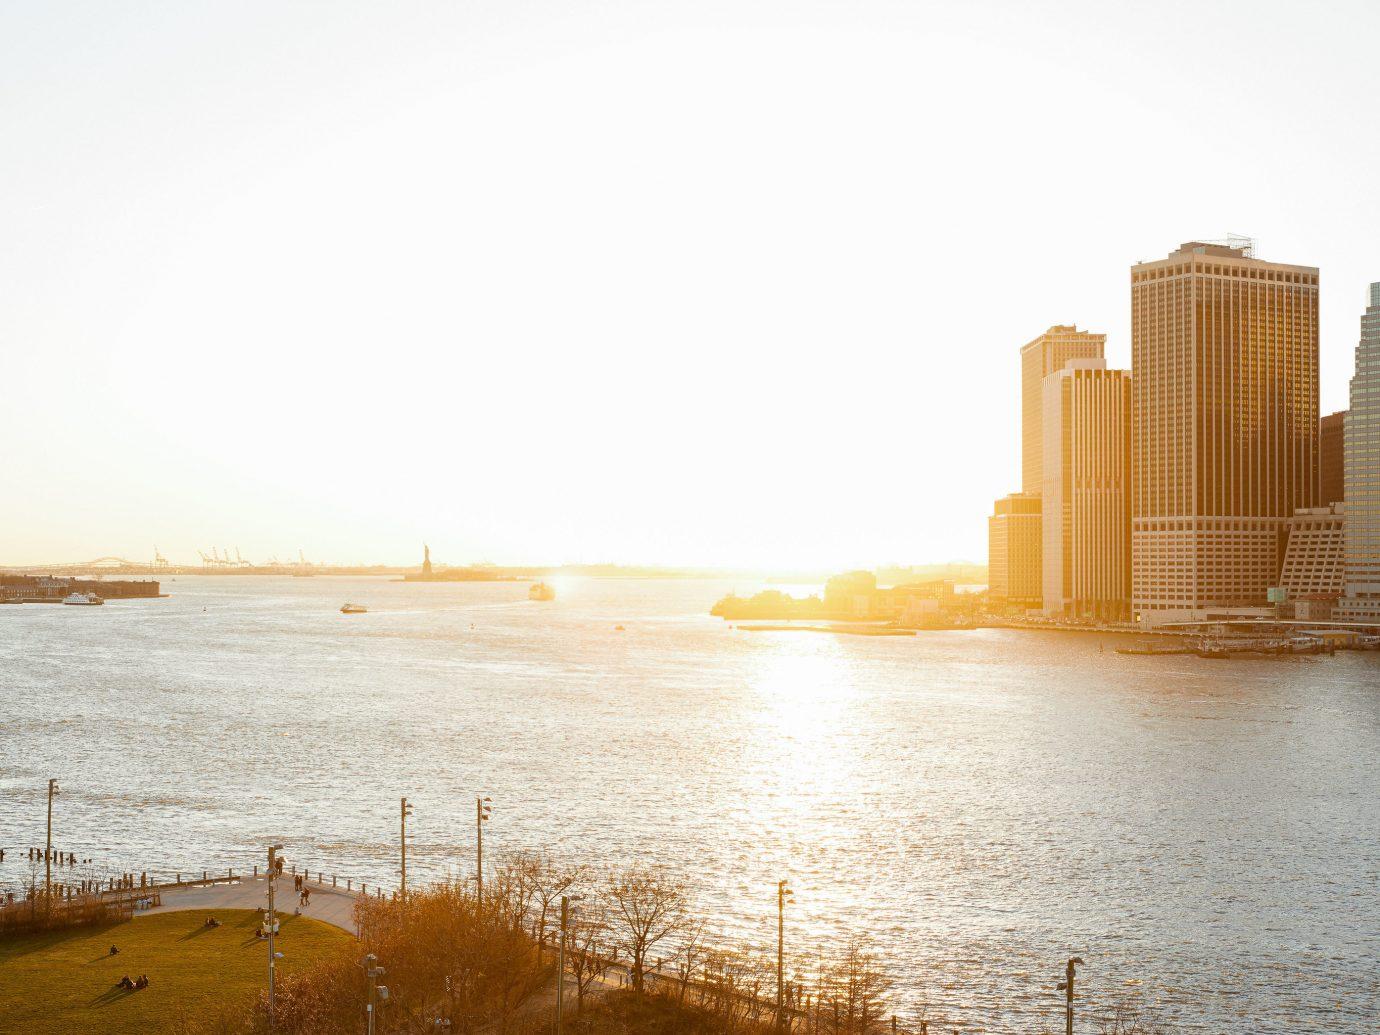 Food + Drink NYC sky water Sea horizon morning sunlight reflection skyline calm City evening building